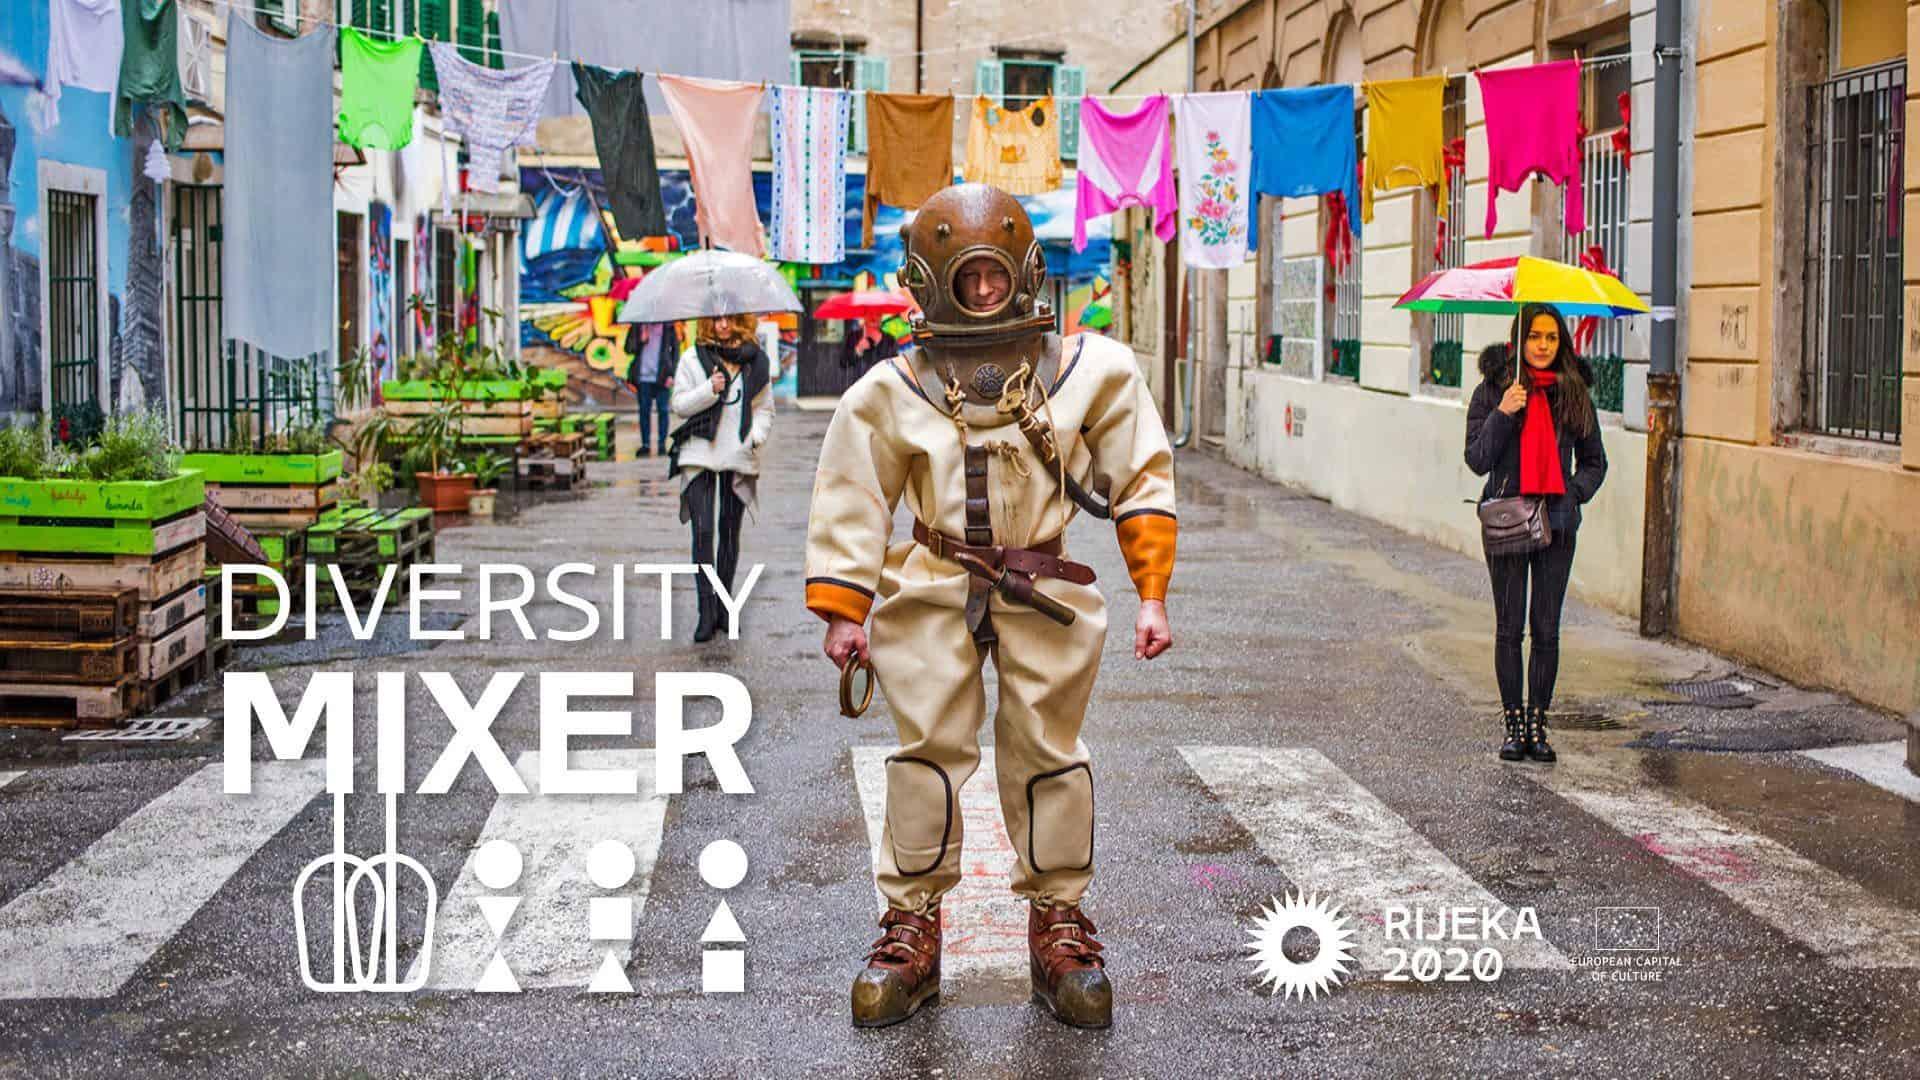 Diversity Mixer – Cultural participation: diversity and inclusion